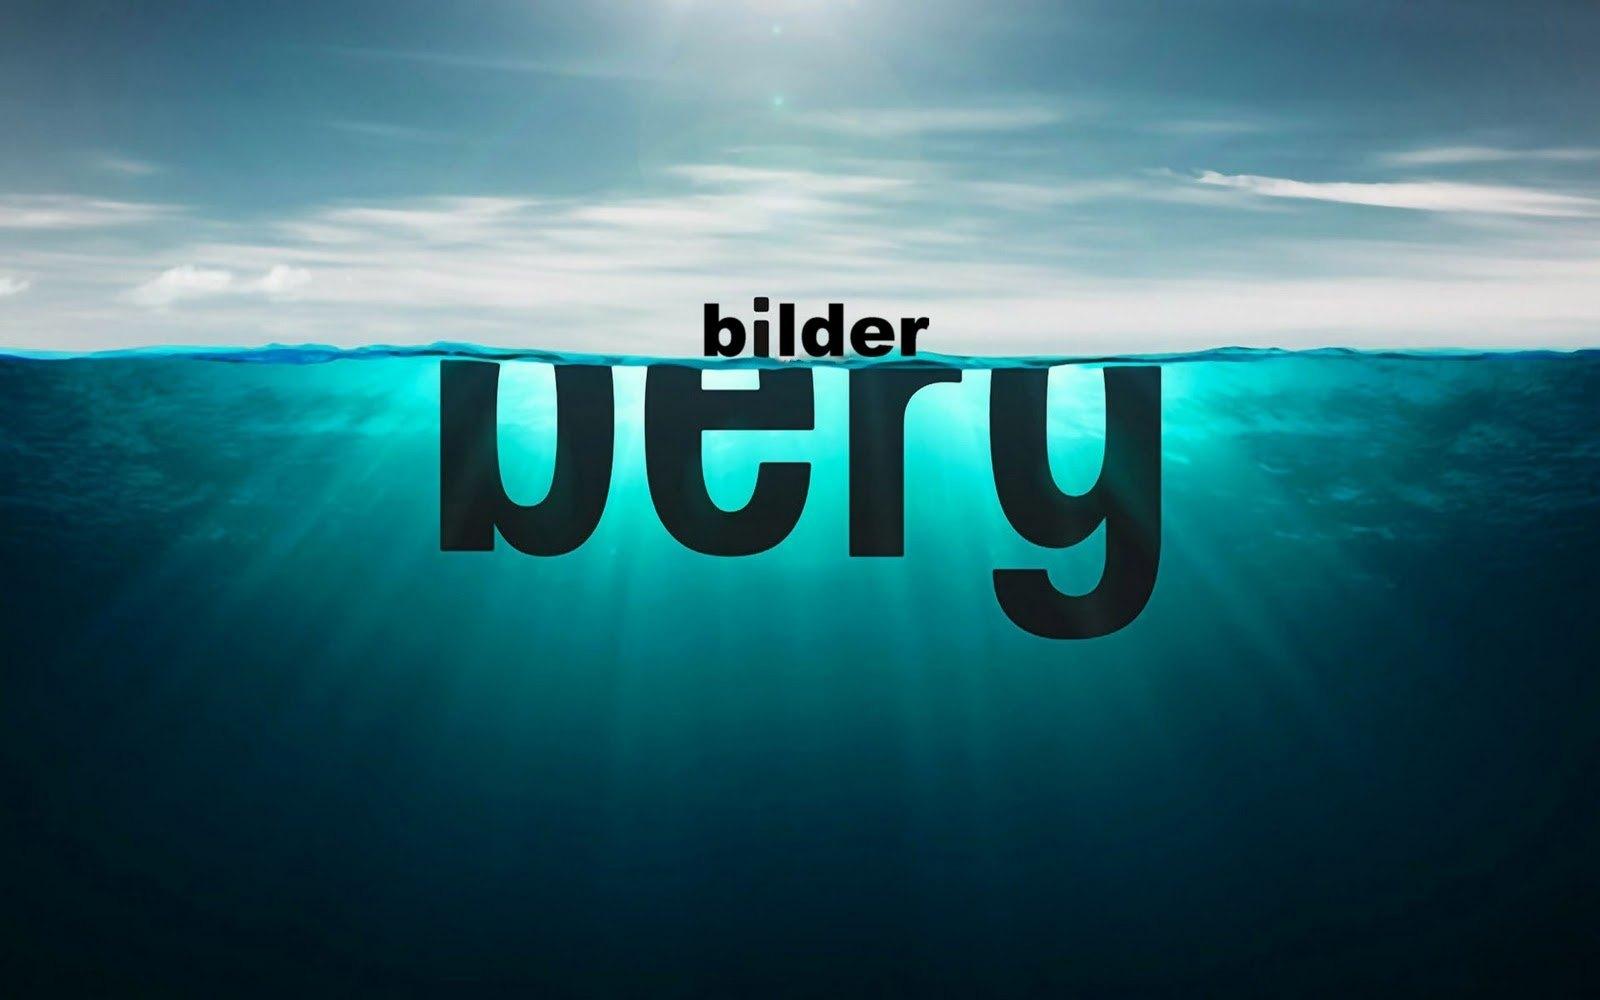 monde - Groupe Bilderberg : le monde qu'ils nous préparent Bilderberg-group-tip-of-iceberg